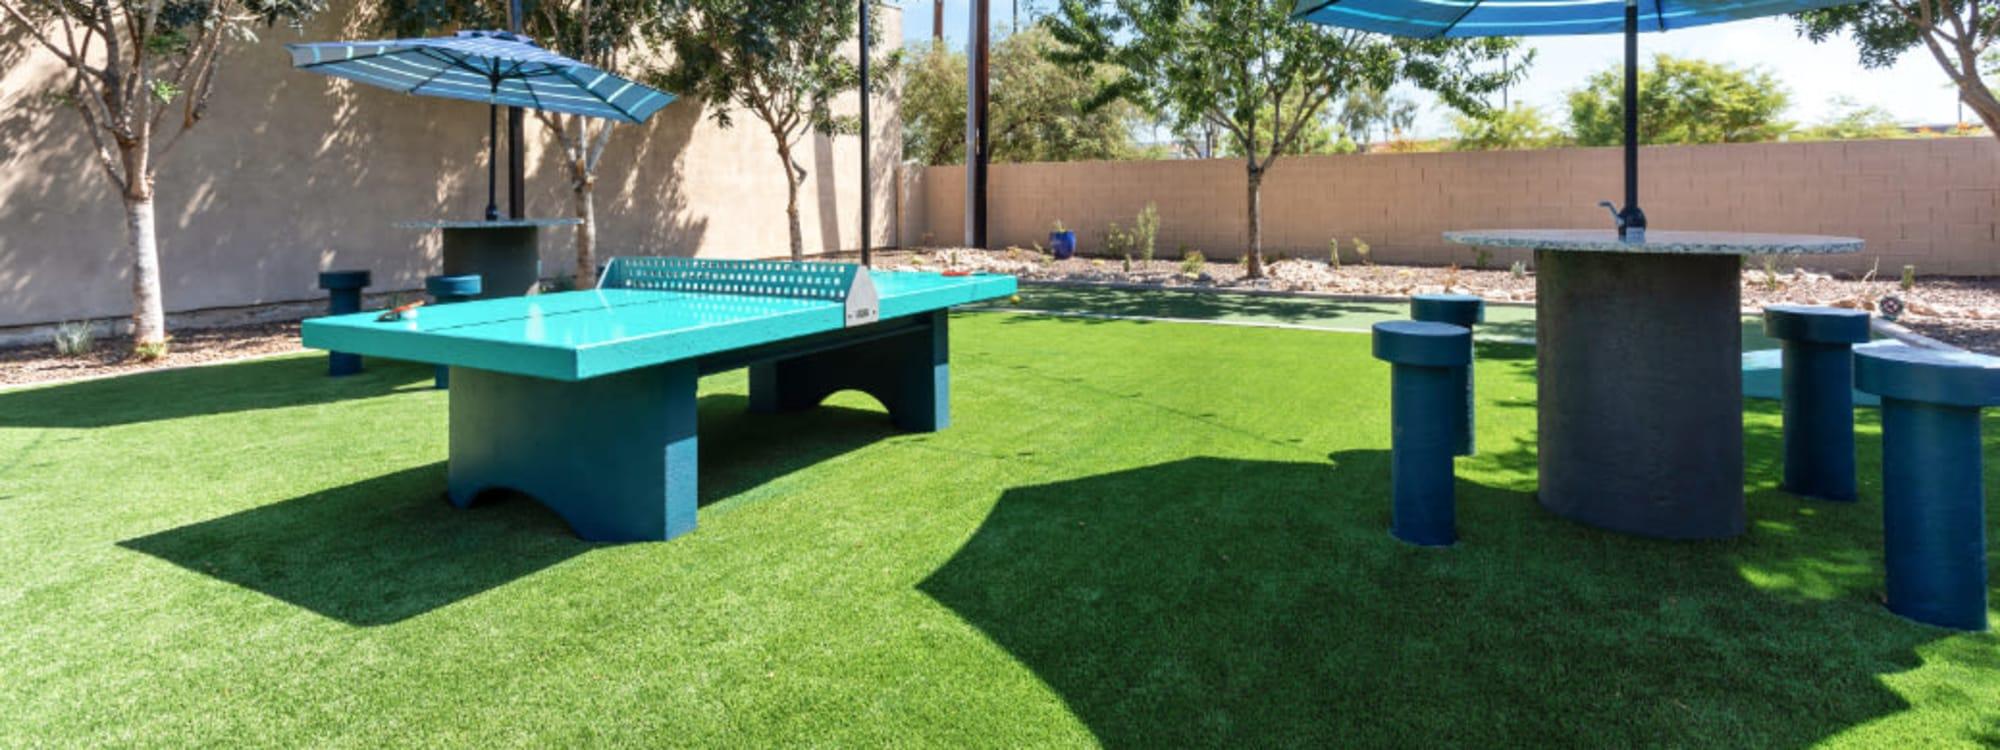 Photos of 1408 Casitas at Palm Valley in Avondale, Arizona